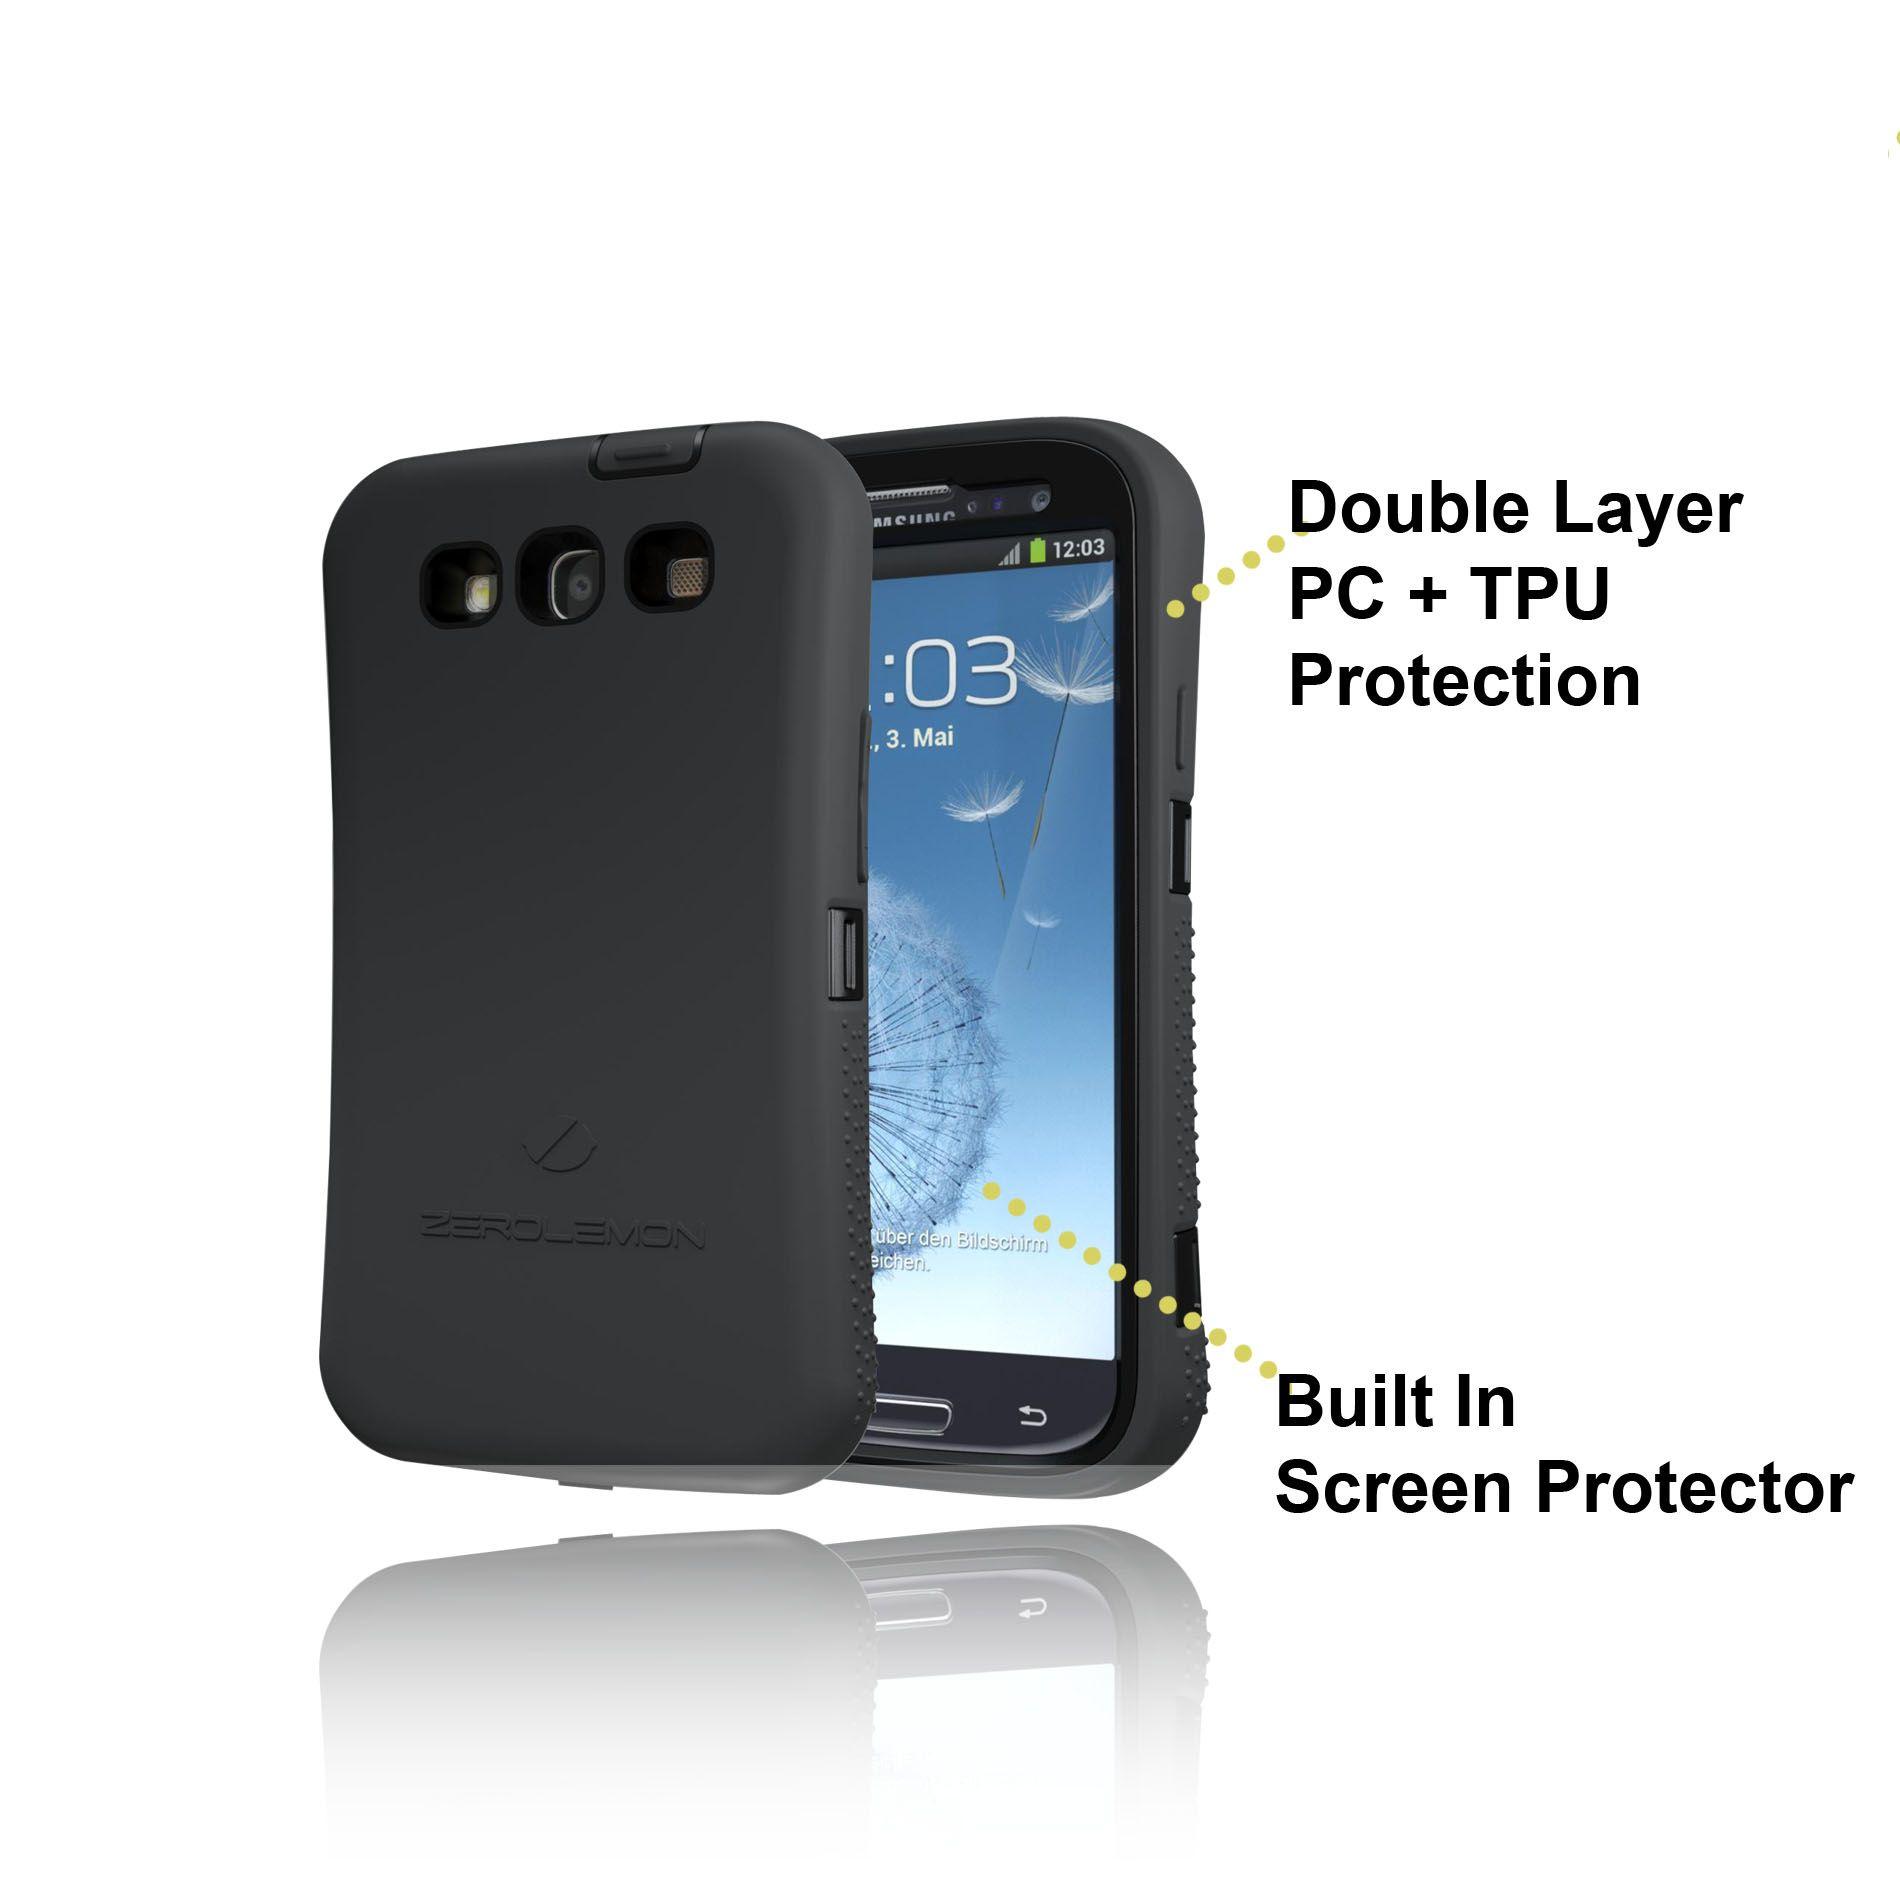 finest selection 10aca 712cf ZeroLemon Samsung Galaxy S III Black Extended TPU Full Edge ...